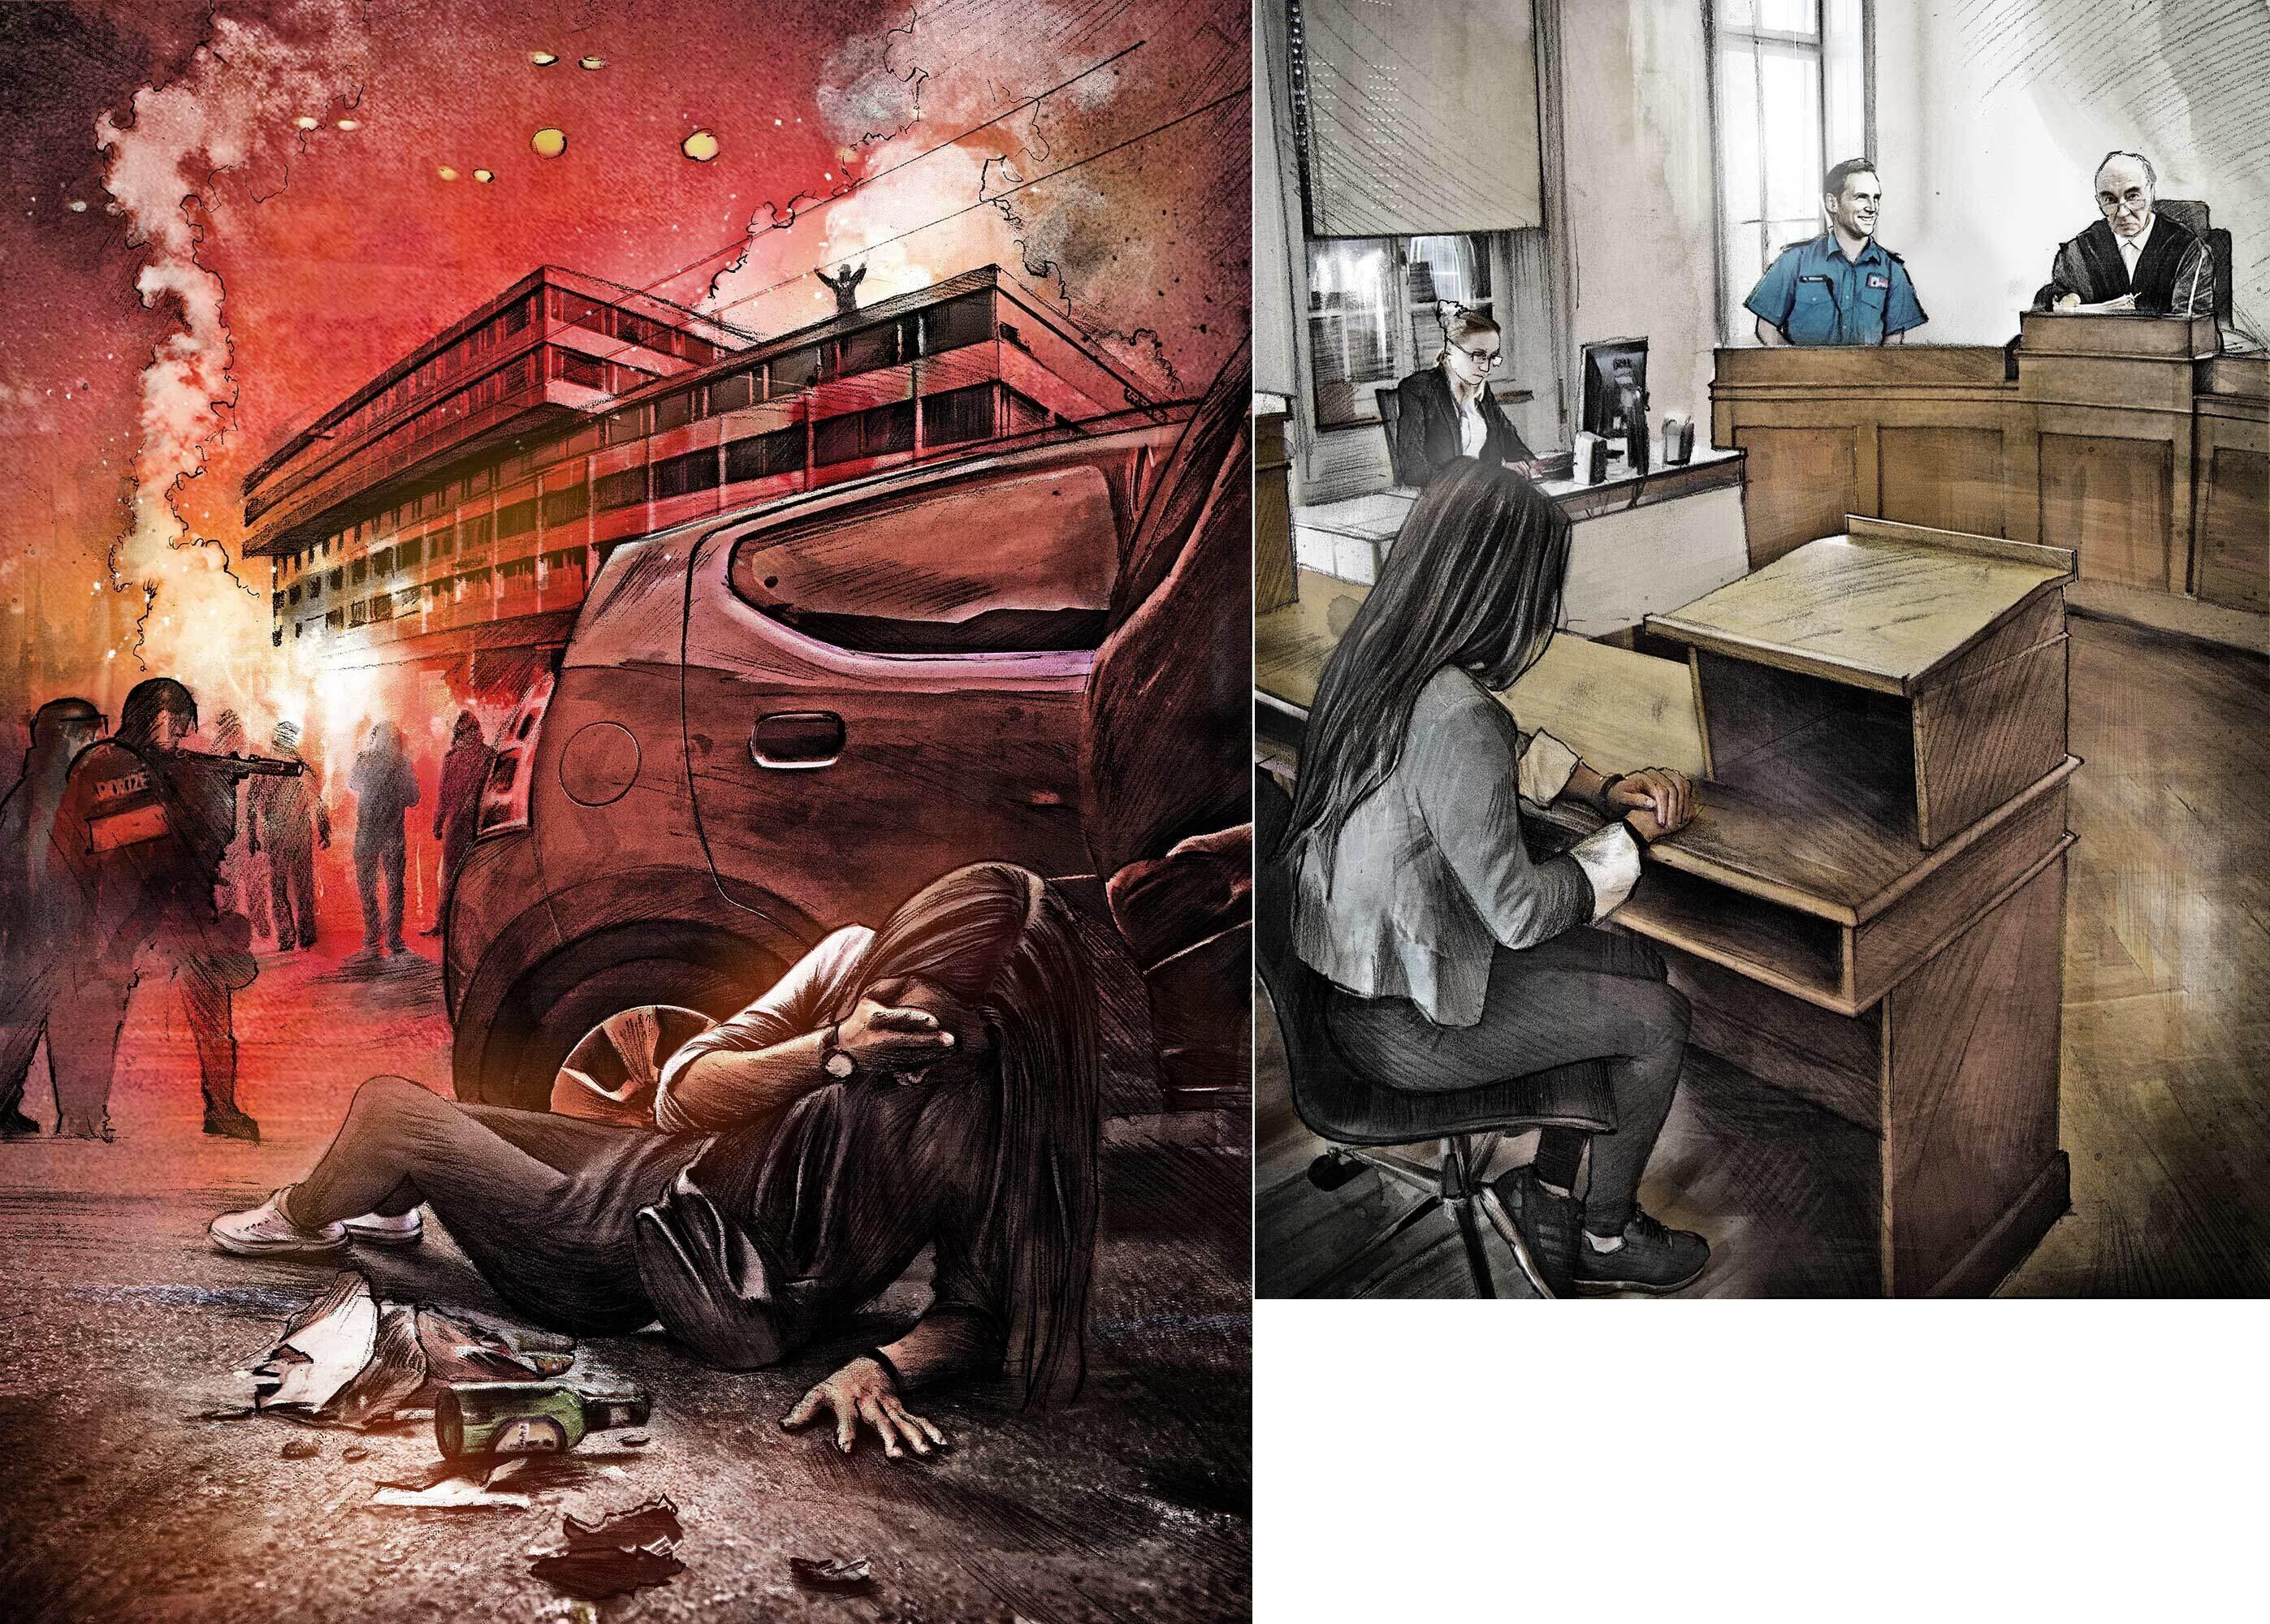 Demo Illustration Gericht Polizei - Kornel Illustration | Kornel Stadler portfolio